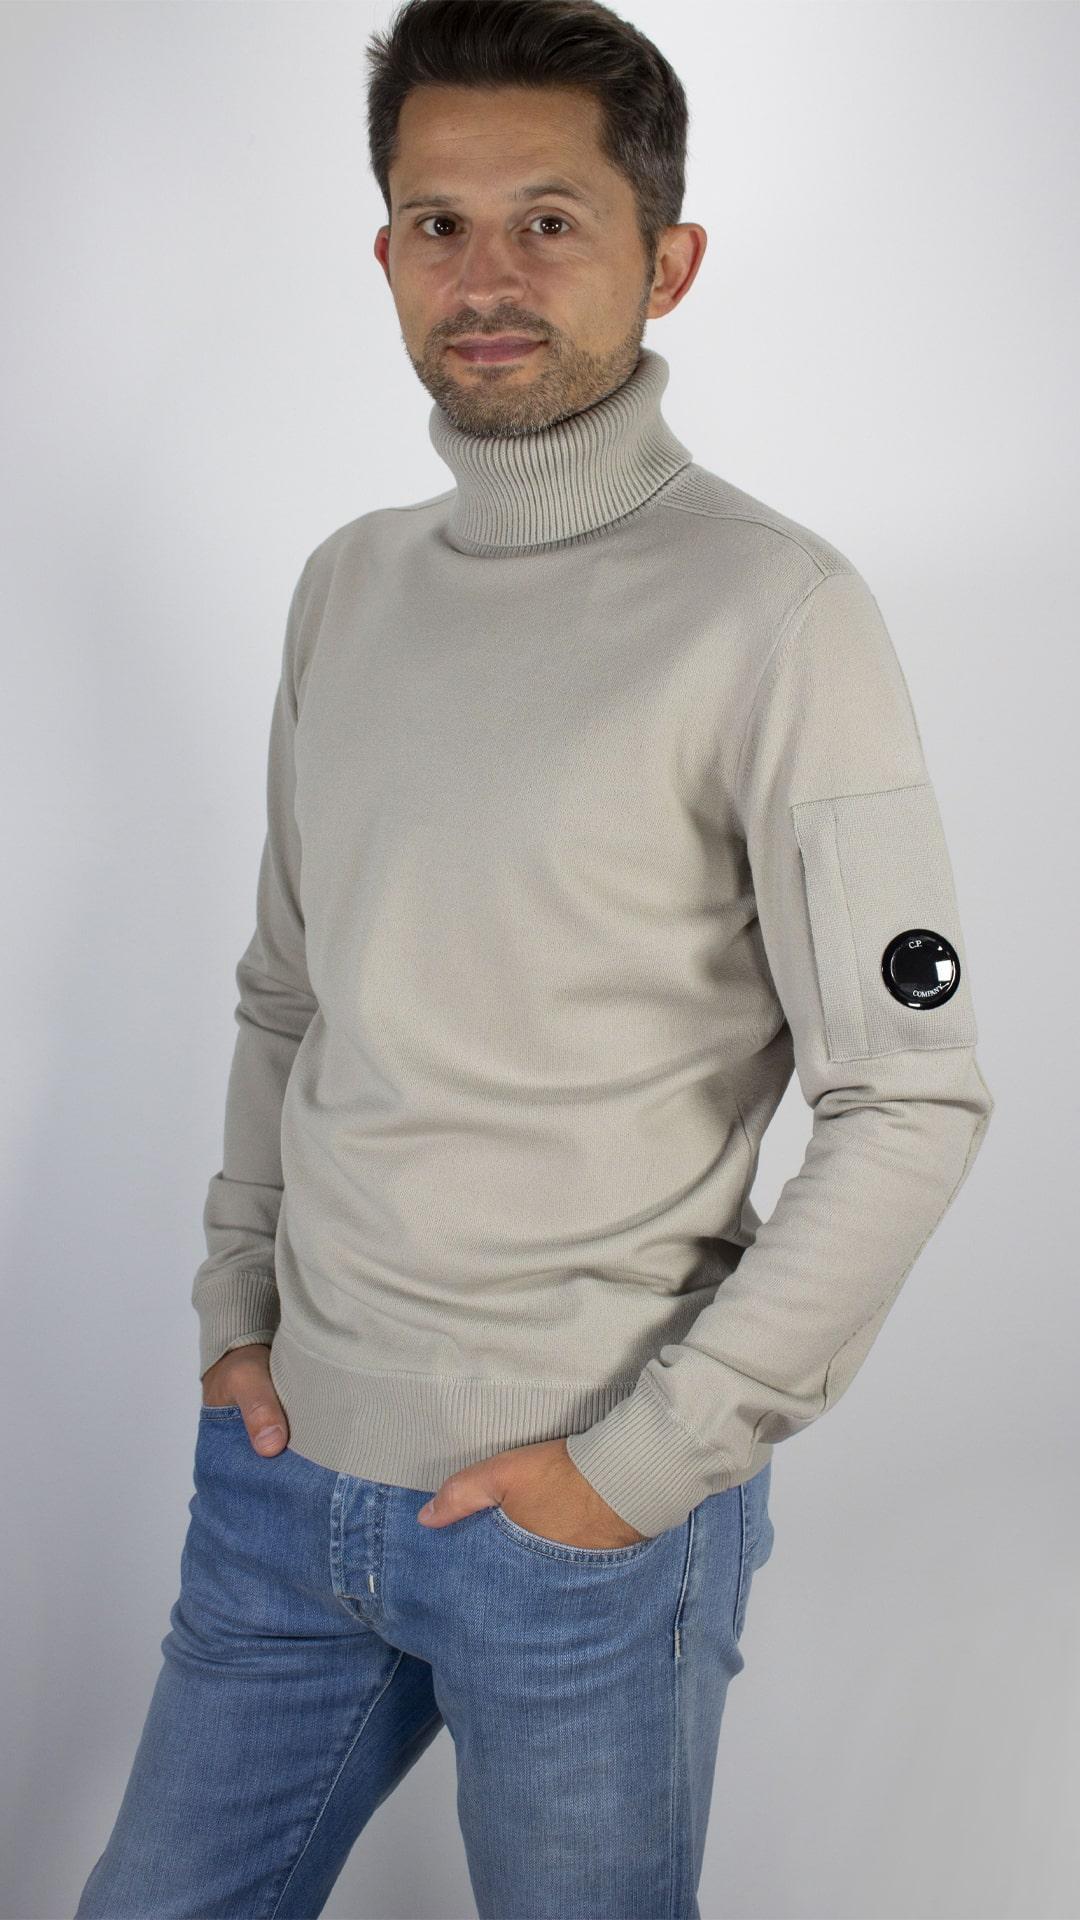 rolli-pullover-cp-company-cp-companypullover-wollpullover-rollkragen-herrenpullover-herbstpullover-herrenmode-bilger-exclusiv-trossingen-min